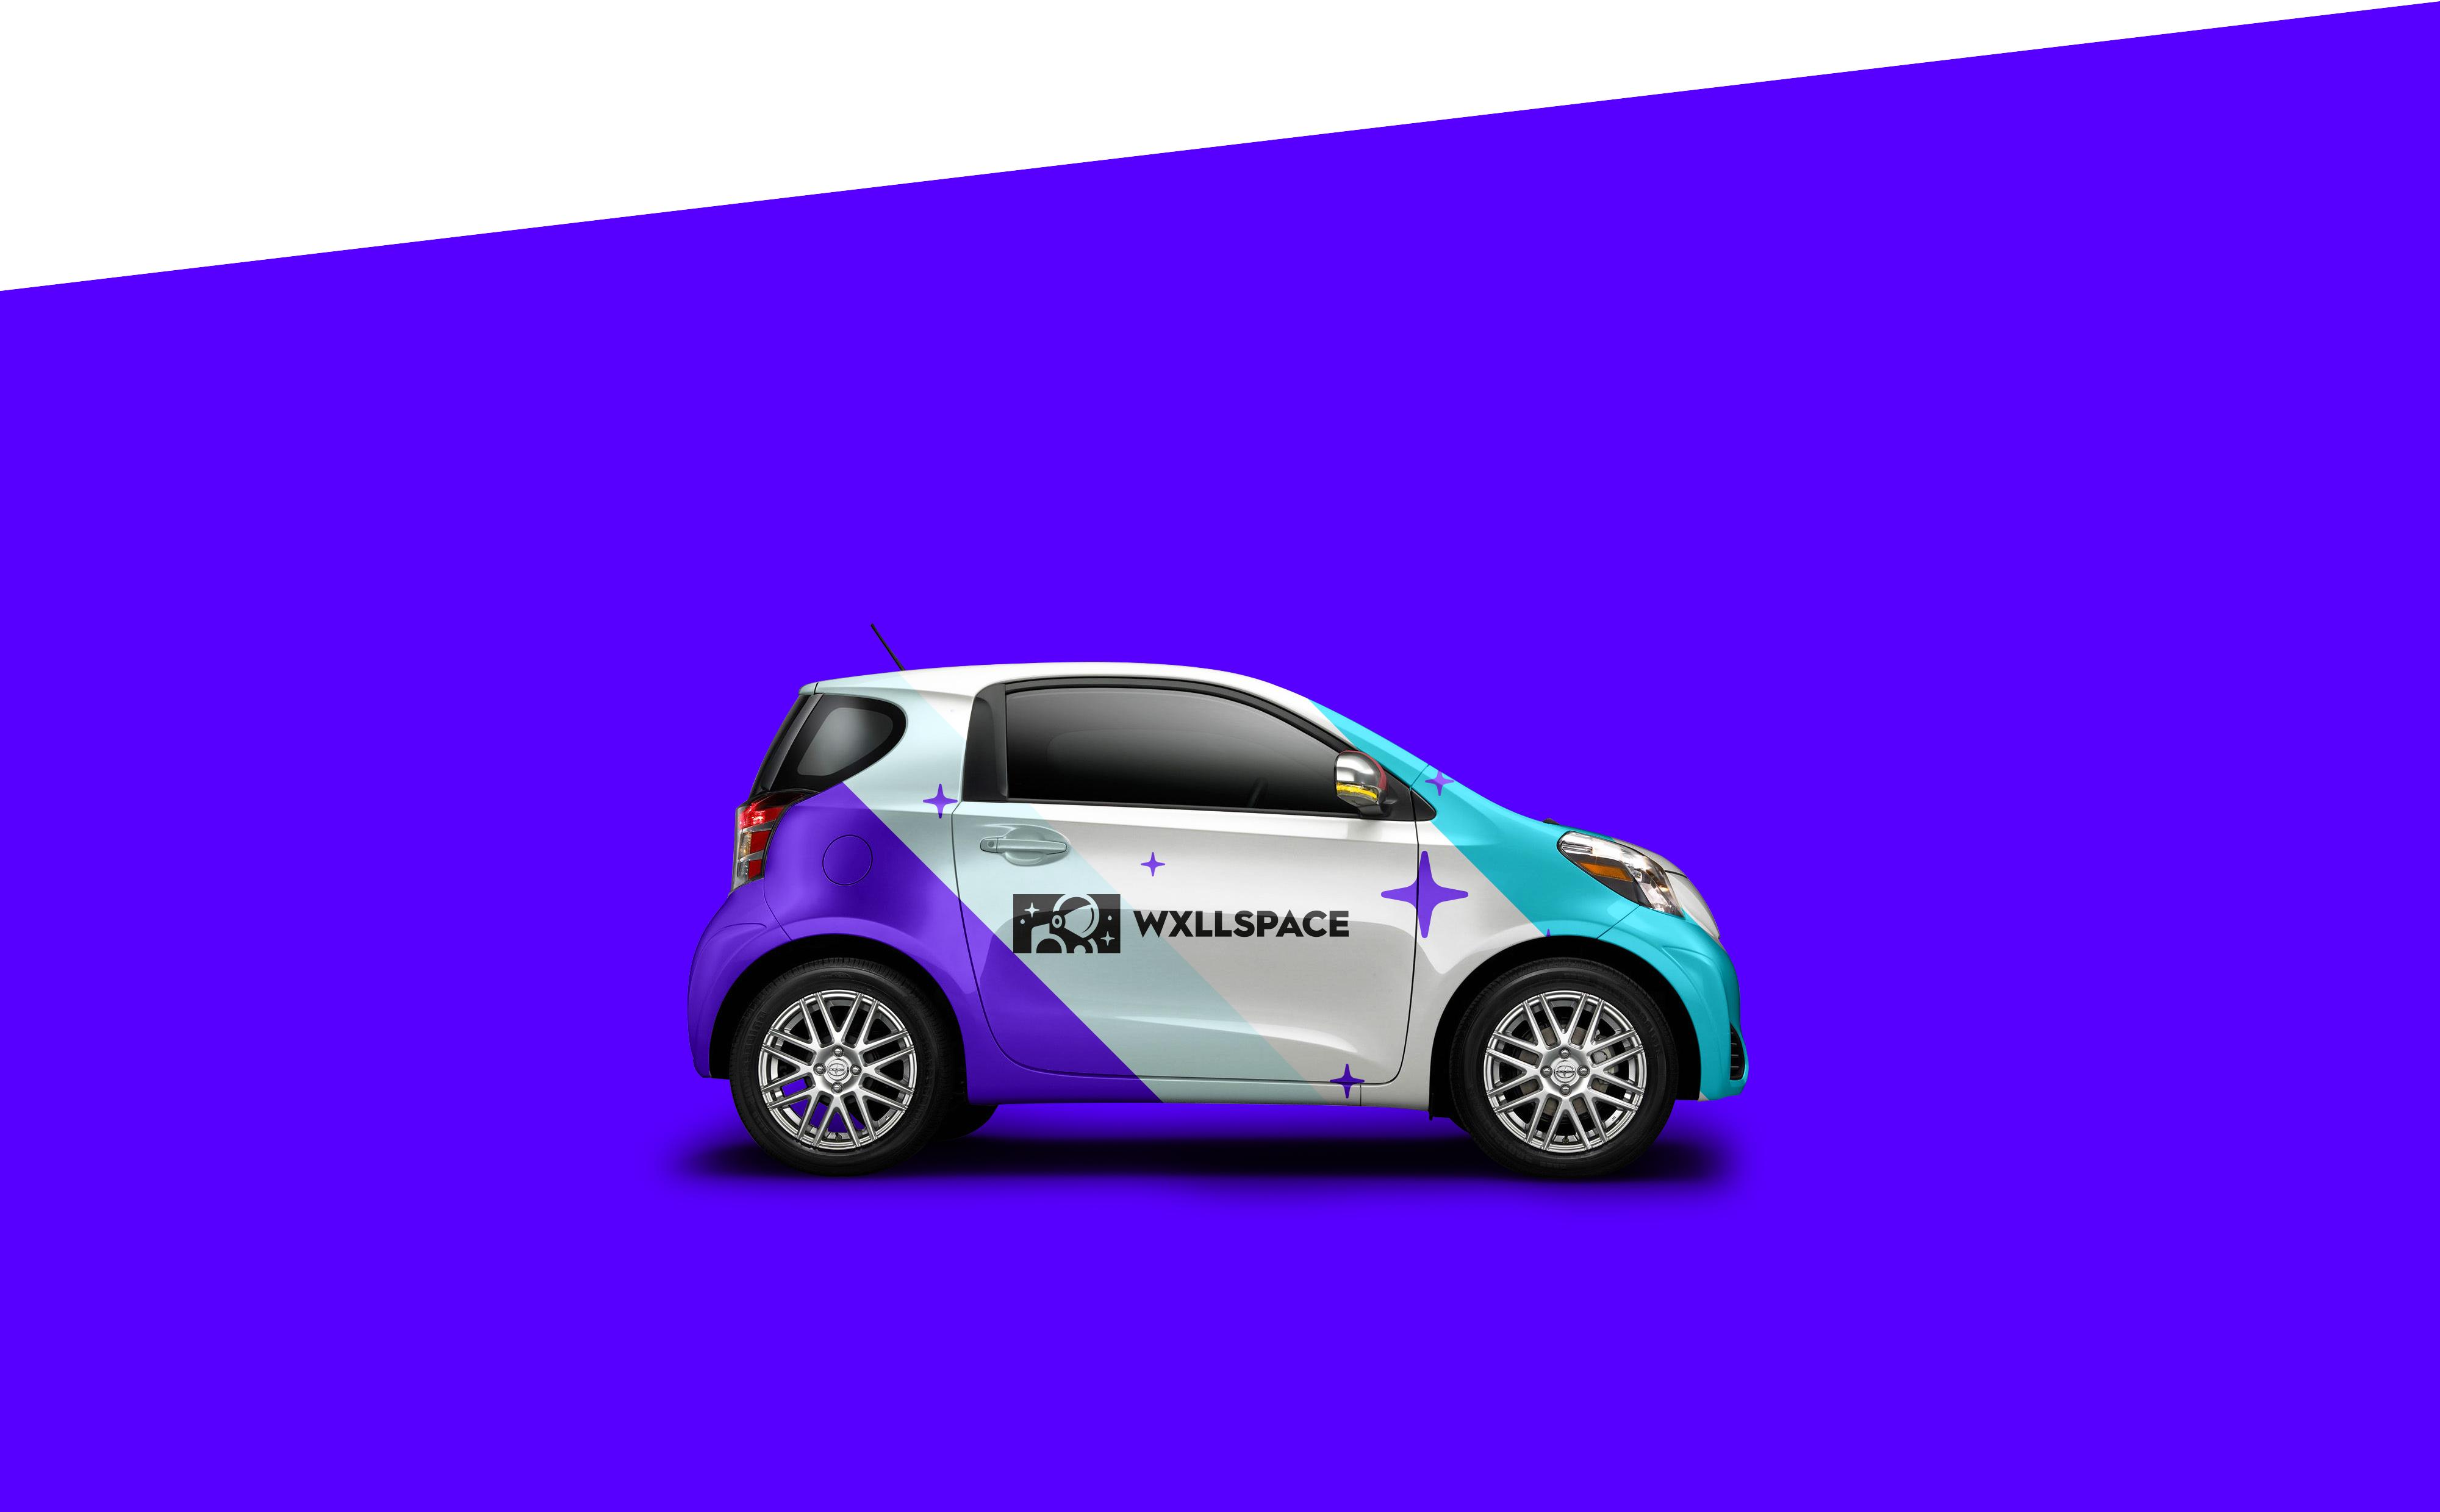 Wxllspace Cars23